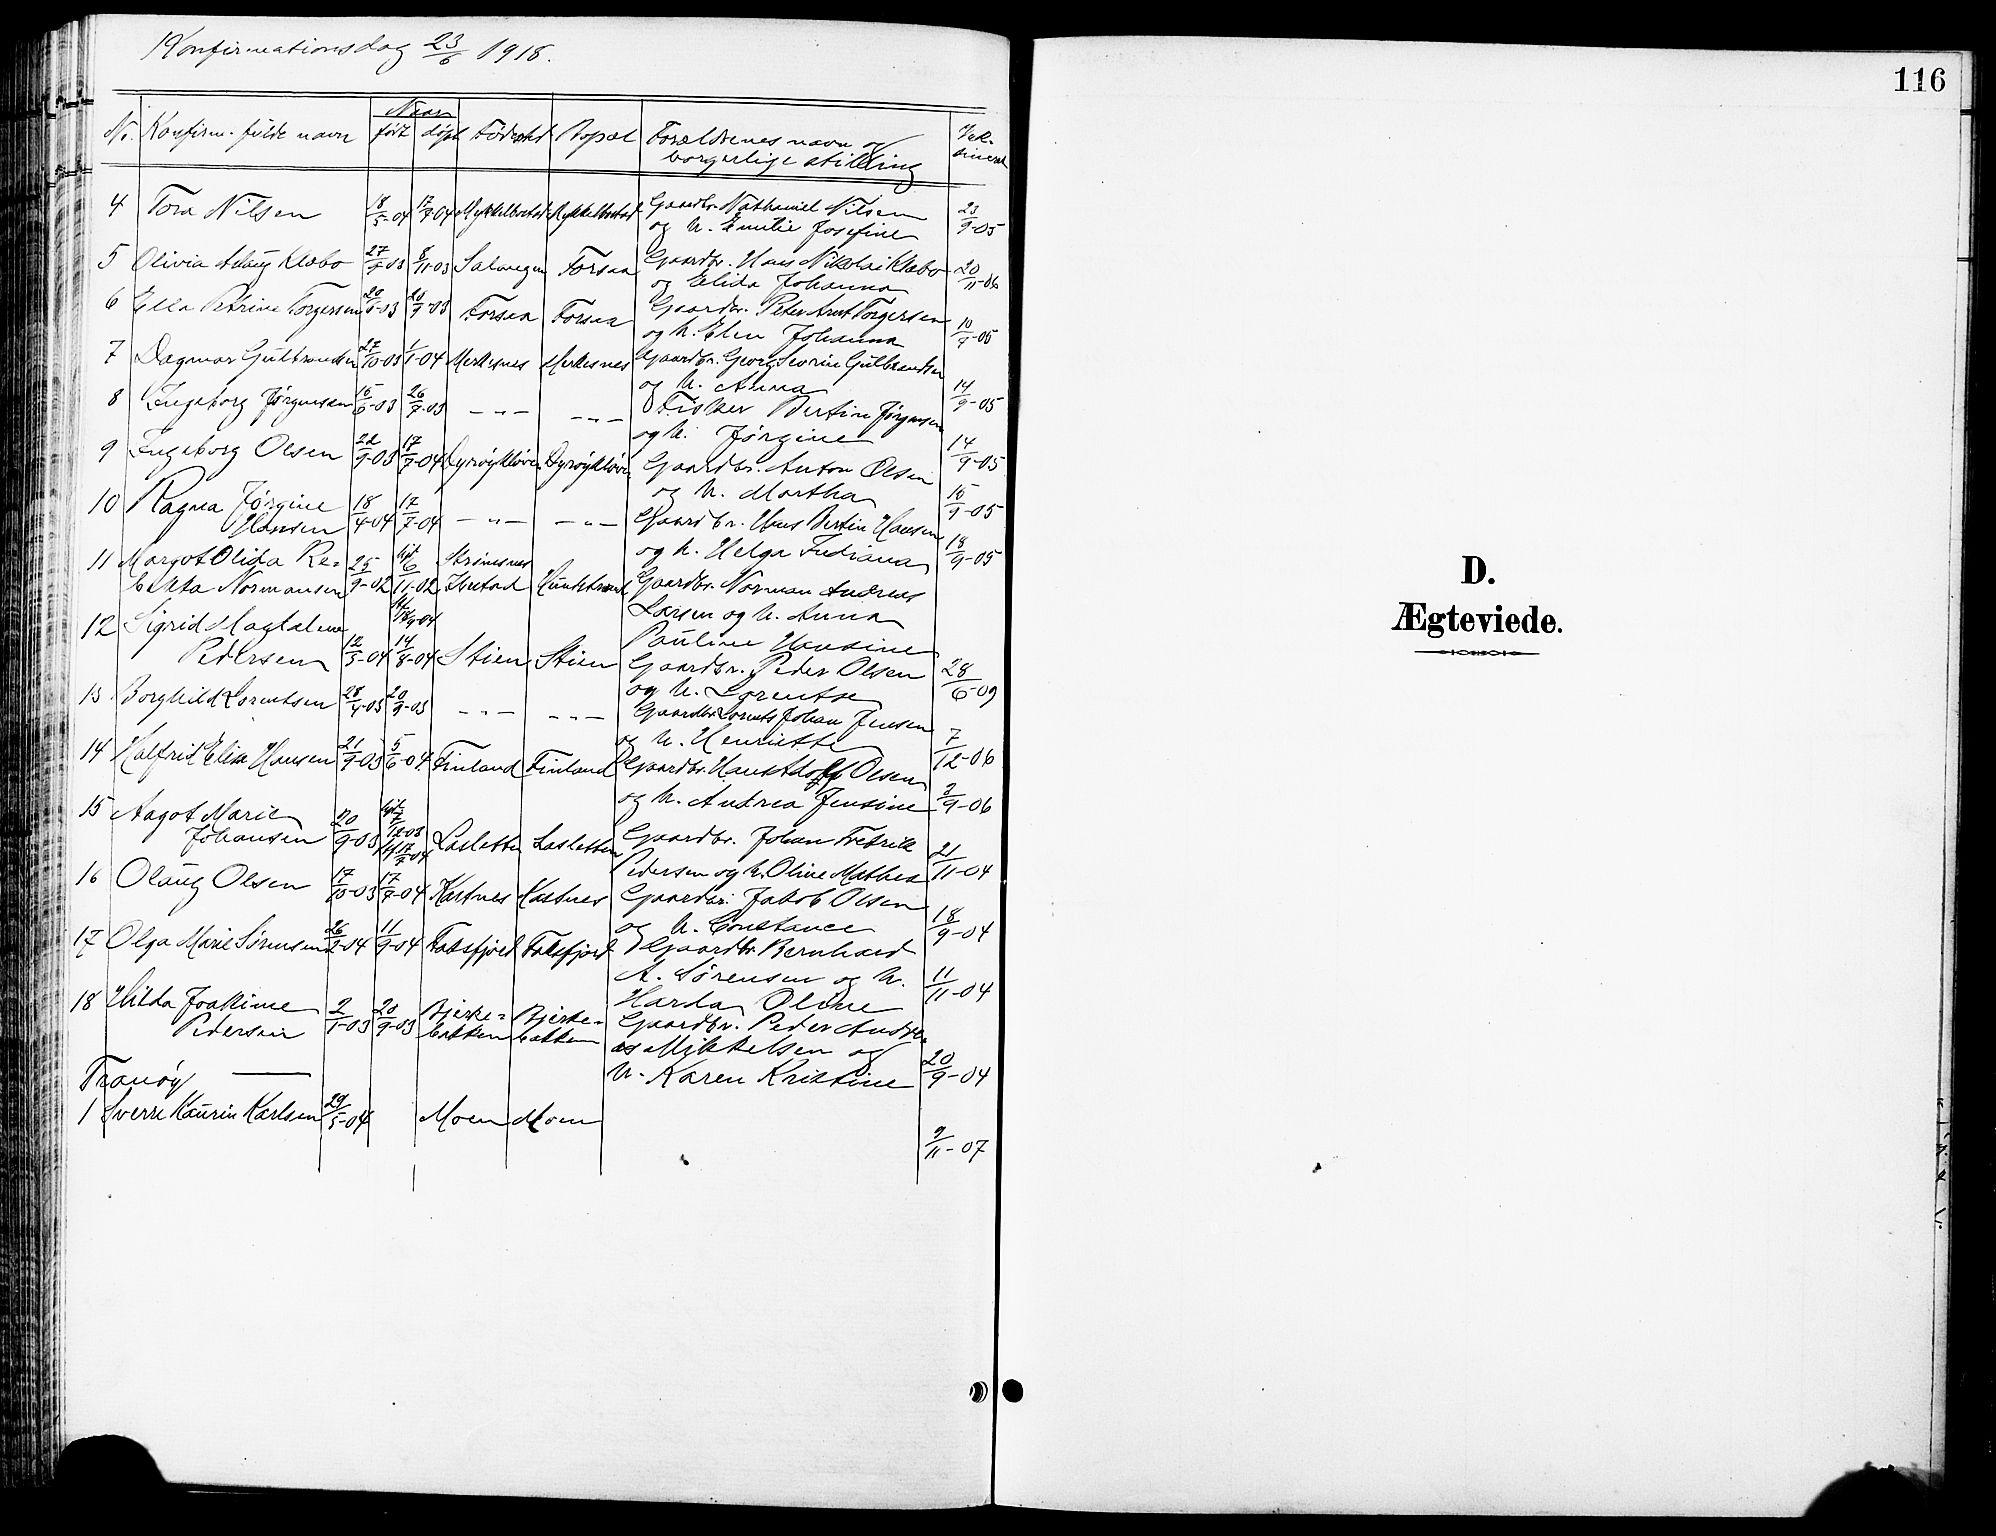 SATØ, Tranøy sokneprestkontor, I/Ia/Iab/L0014klokker: Klokkerbok nr. 14, 1896-1918, s. 116